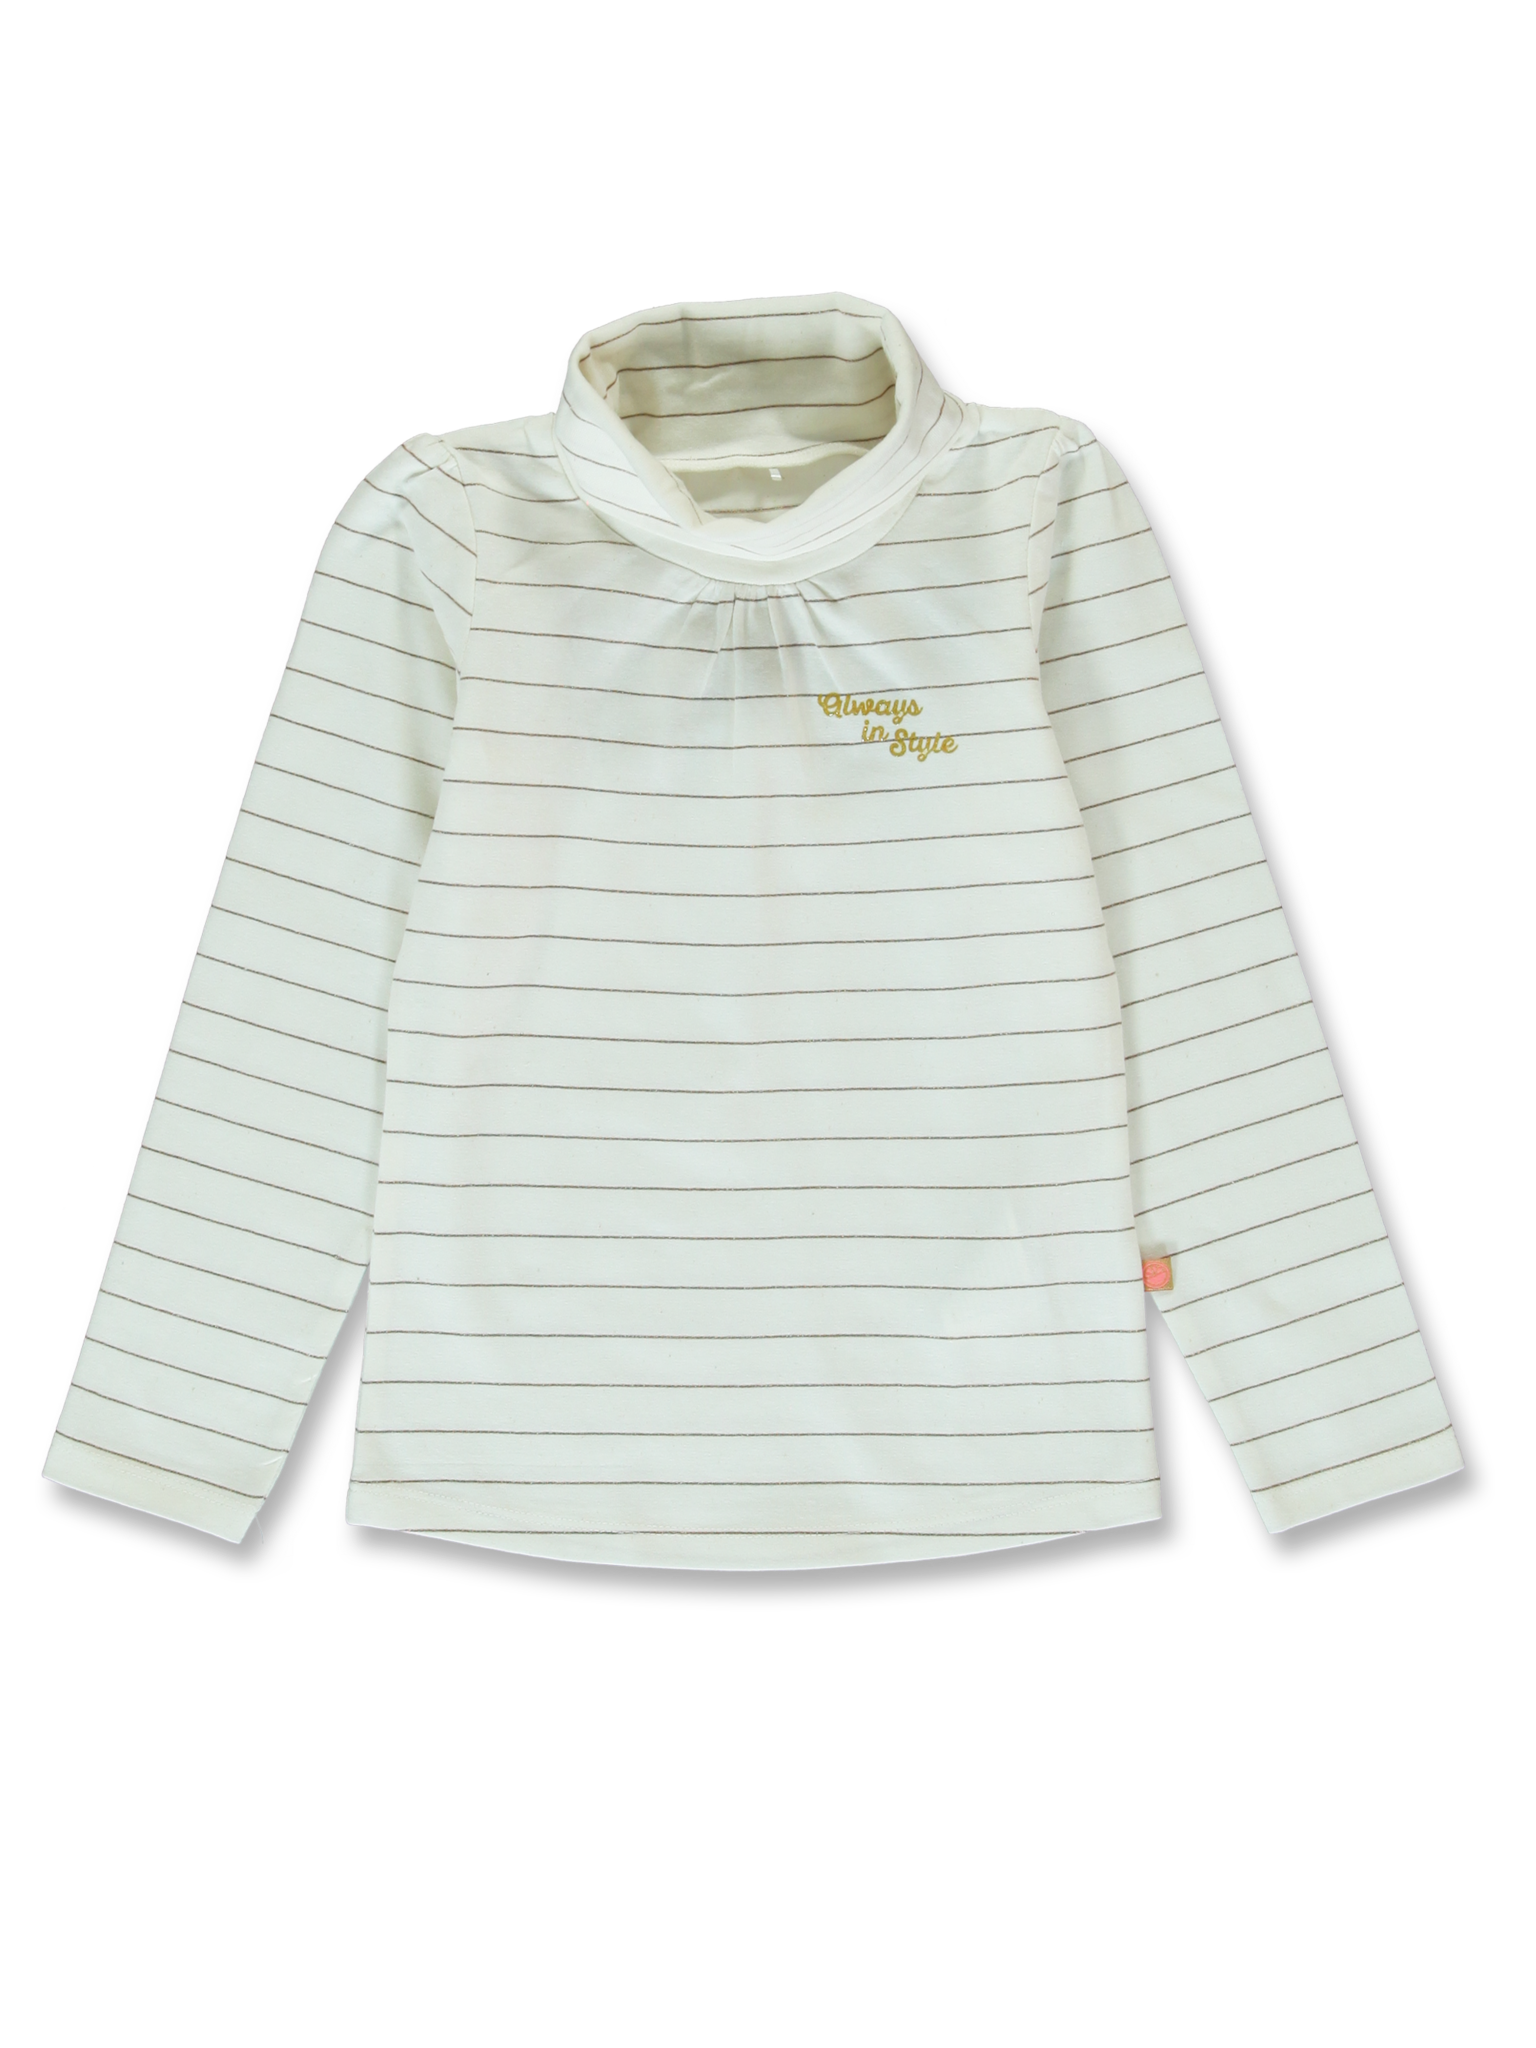 All Brands | Winterproducts Small Girls | Souspull | 12 pcs/box